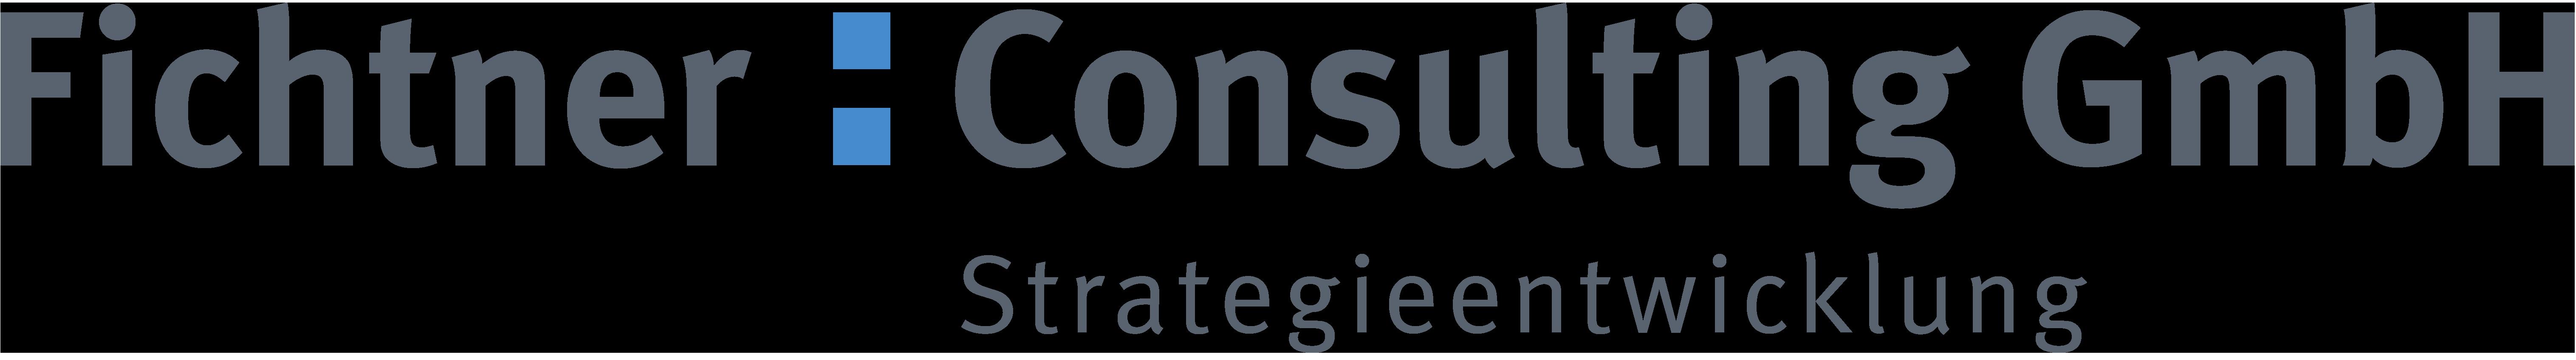 Fichtner Consulting GmbH